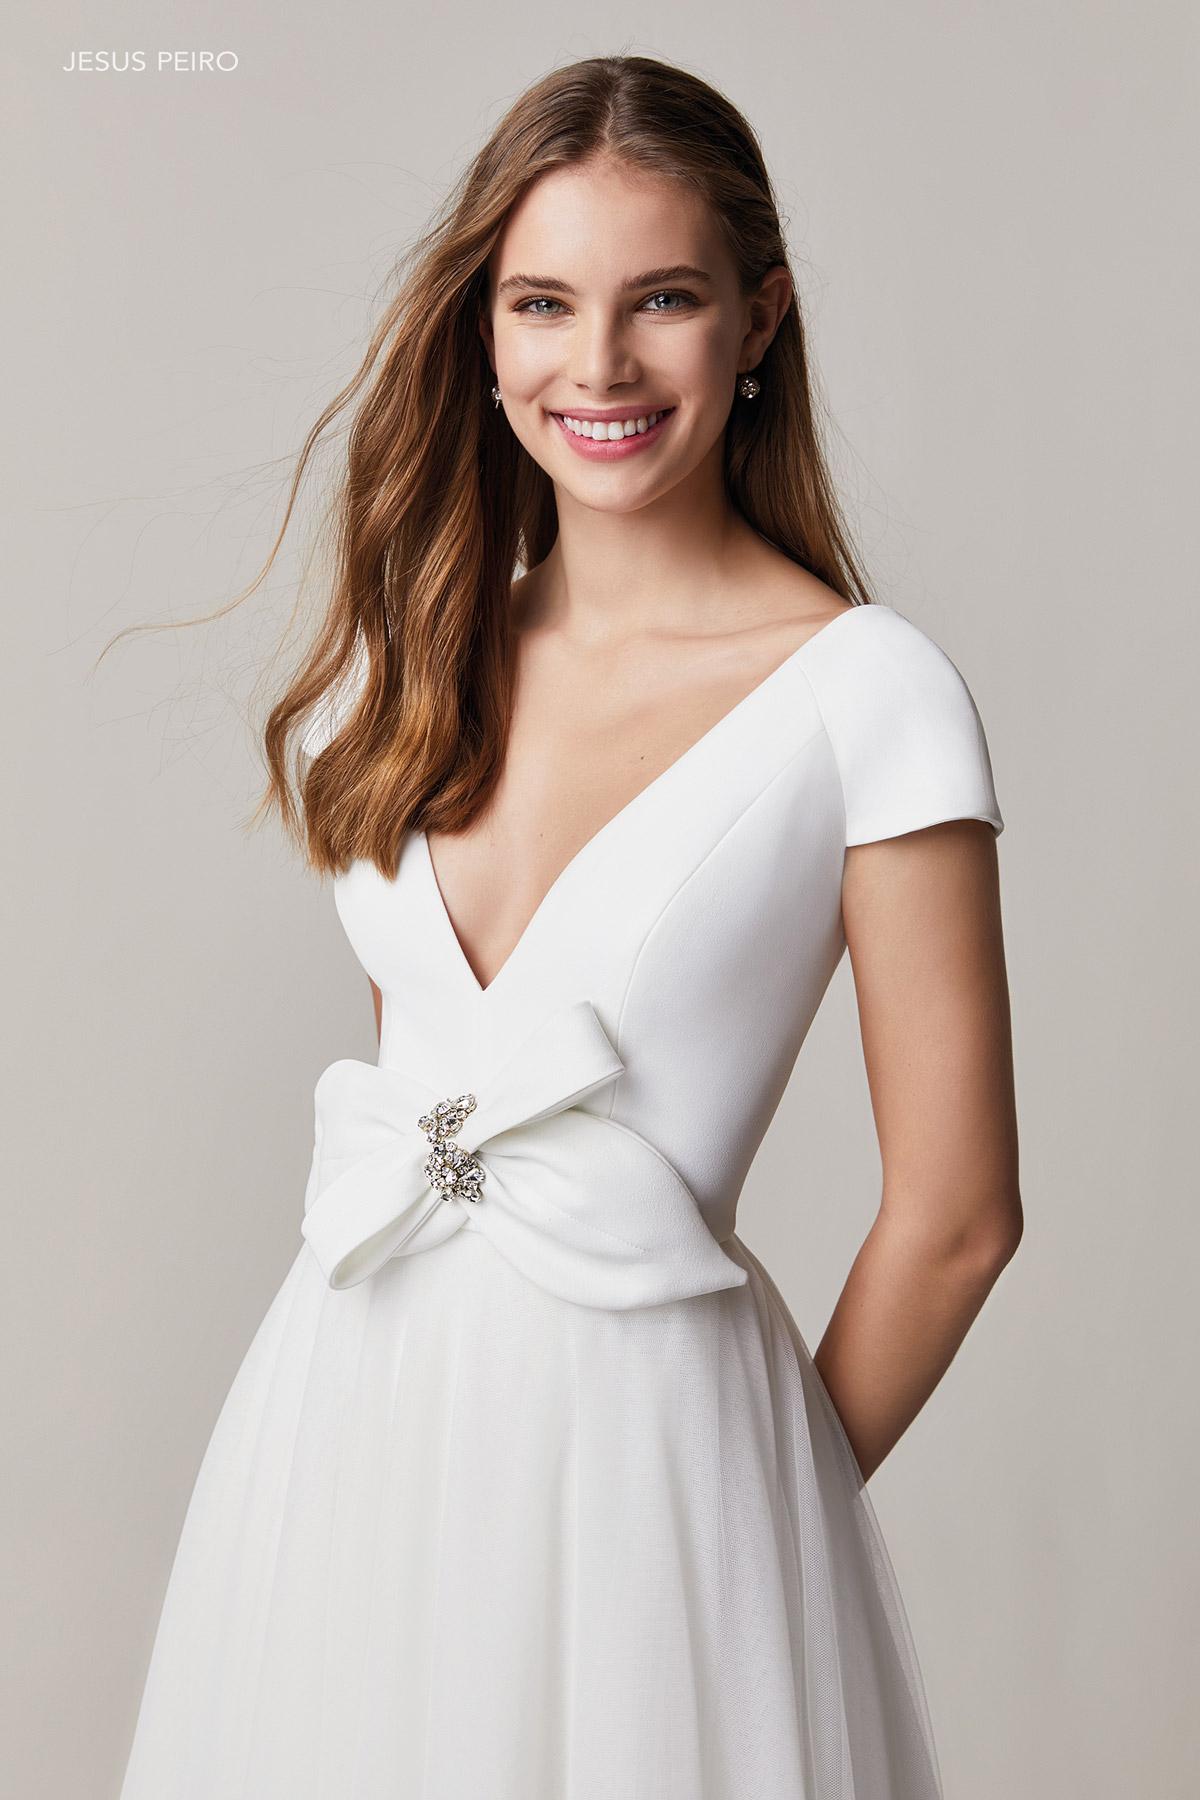 Vestido novia Jesús Peiró Ref.231